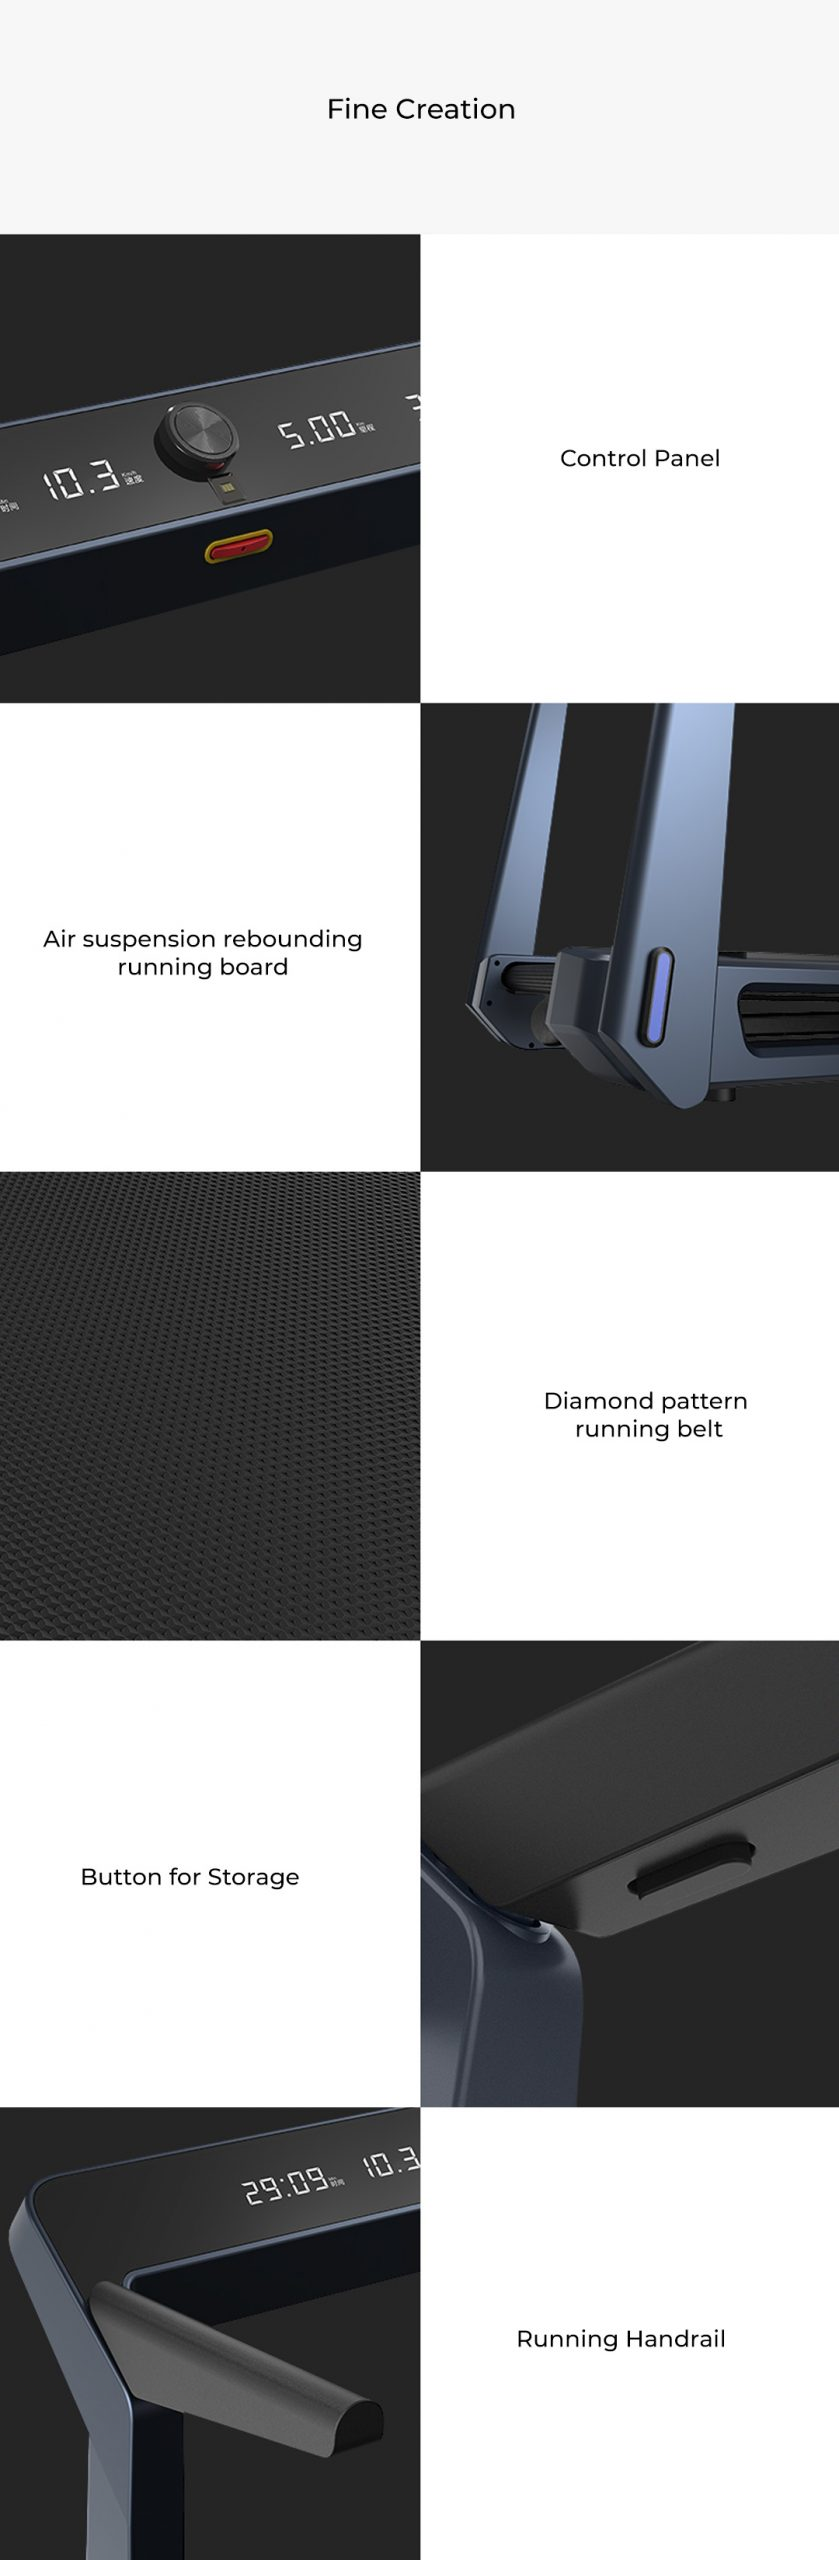 Xiaomi Kingsmith WalkingPad Foldable Treadmill K12 Pro